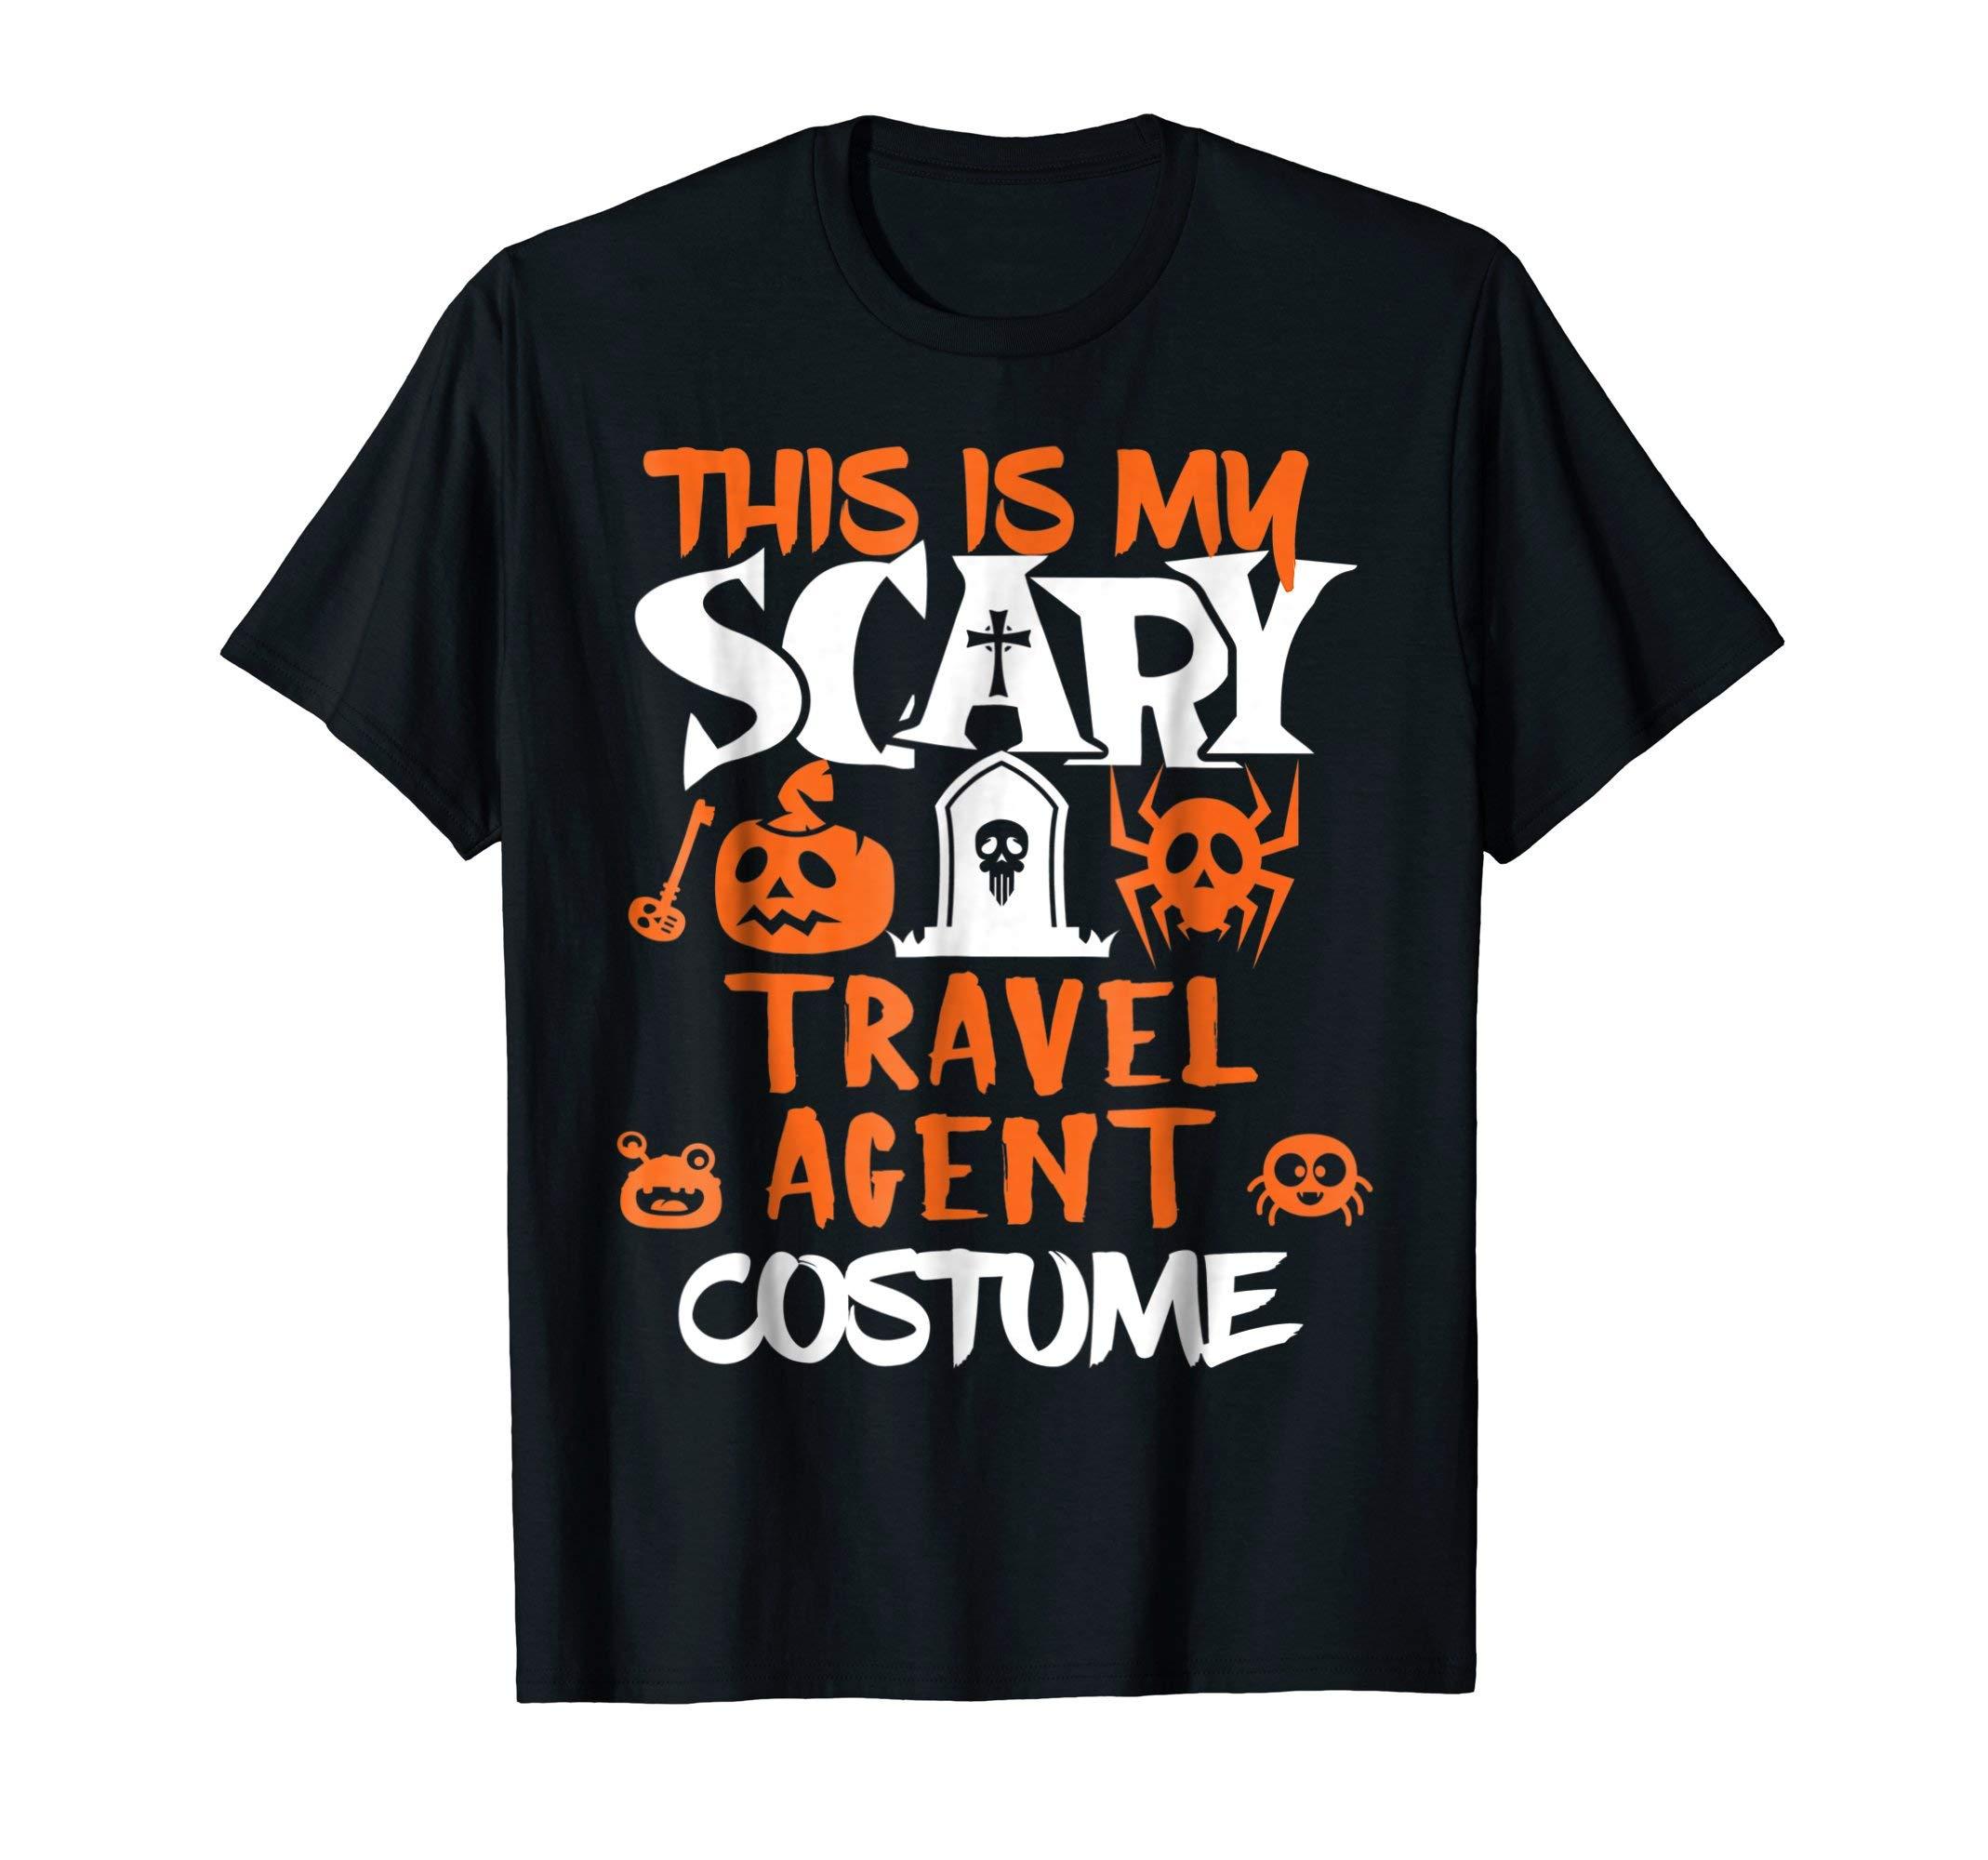 Travel Agent Halloween Costume Funny T-Shirt